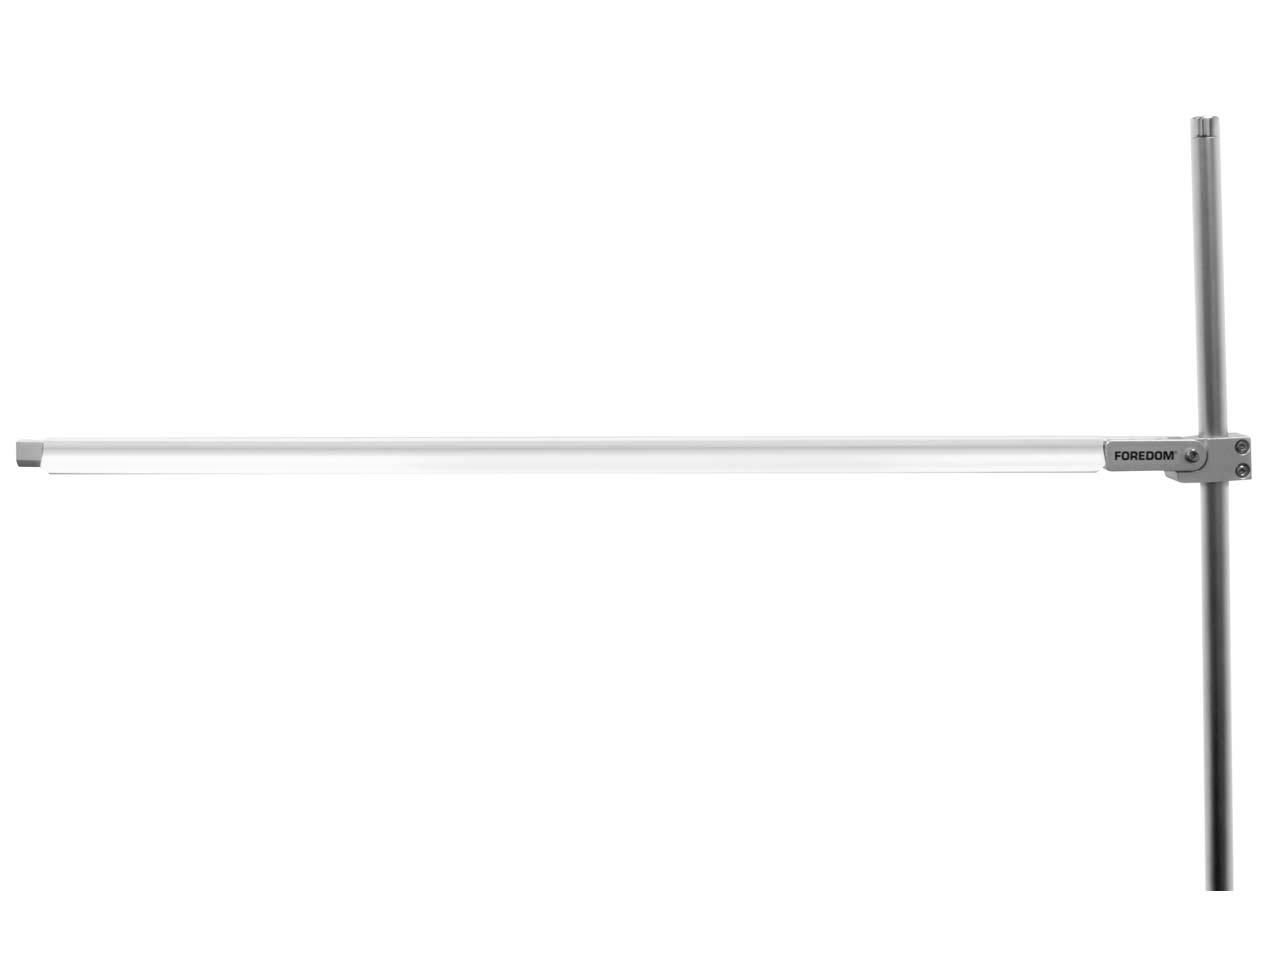 Genuine-US-Foredom-Workbench-Accessories-System miniatura 23